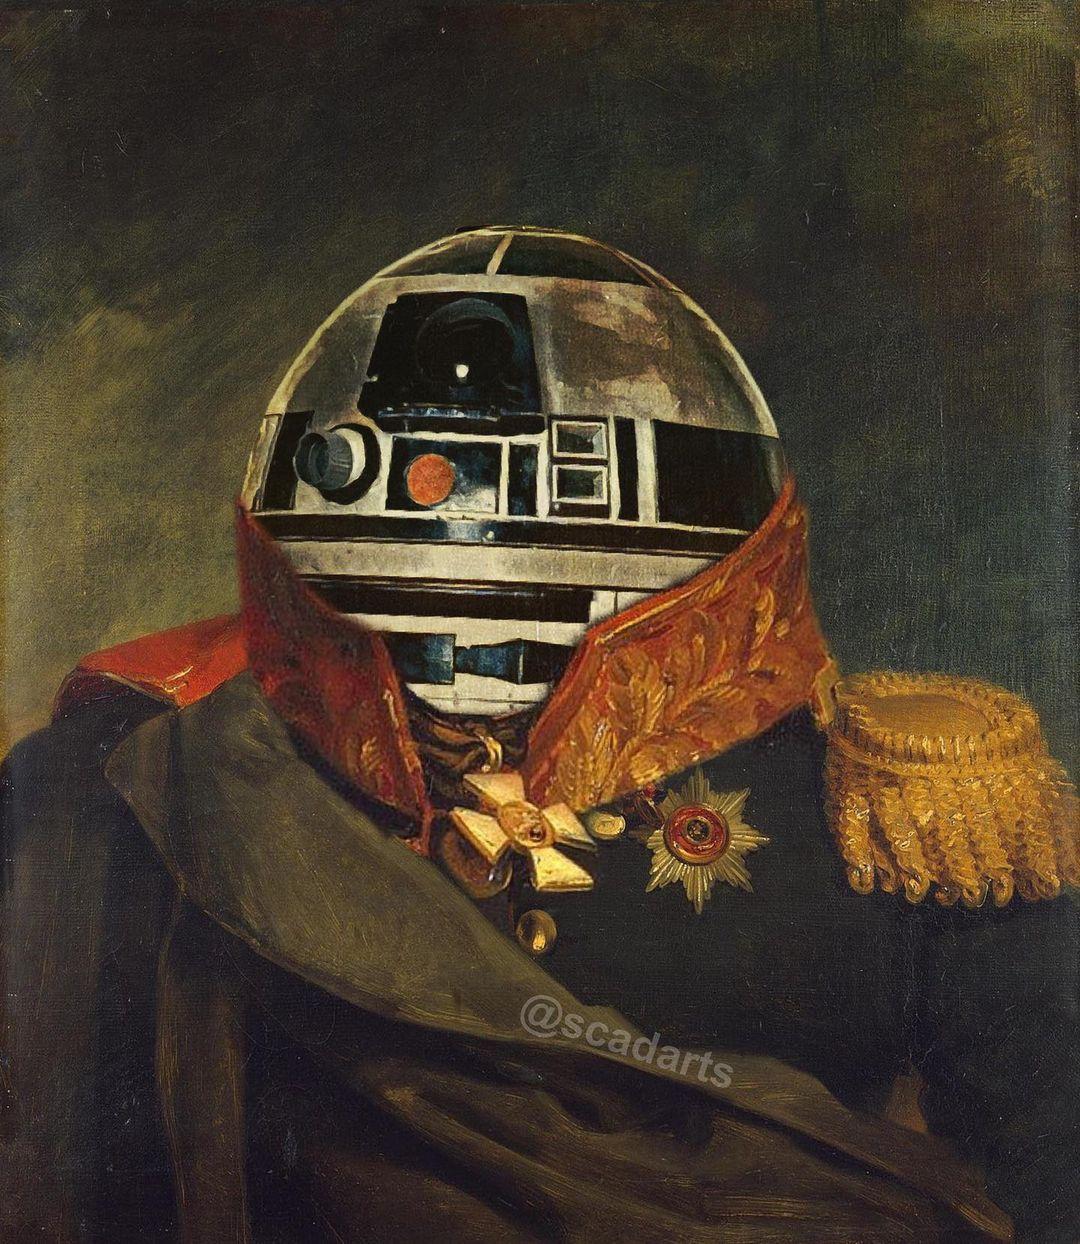 Star Wars Renaissance Portraits